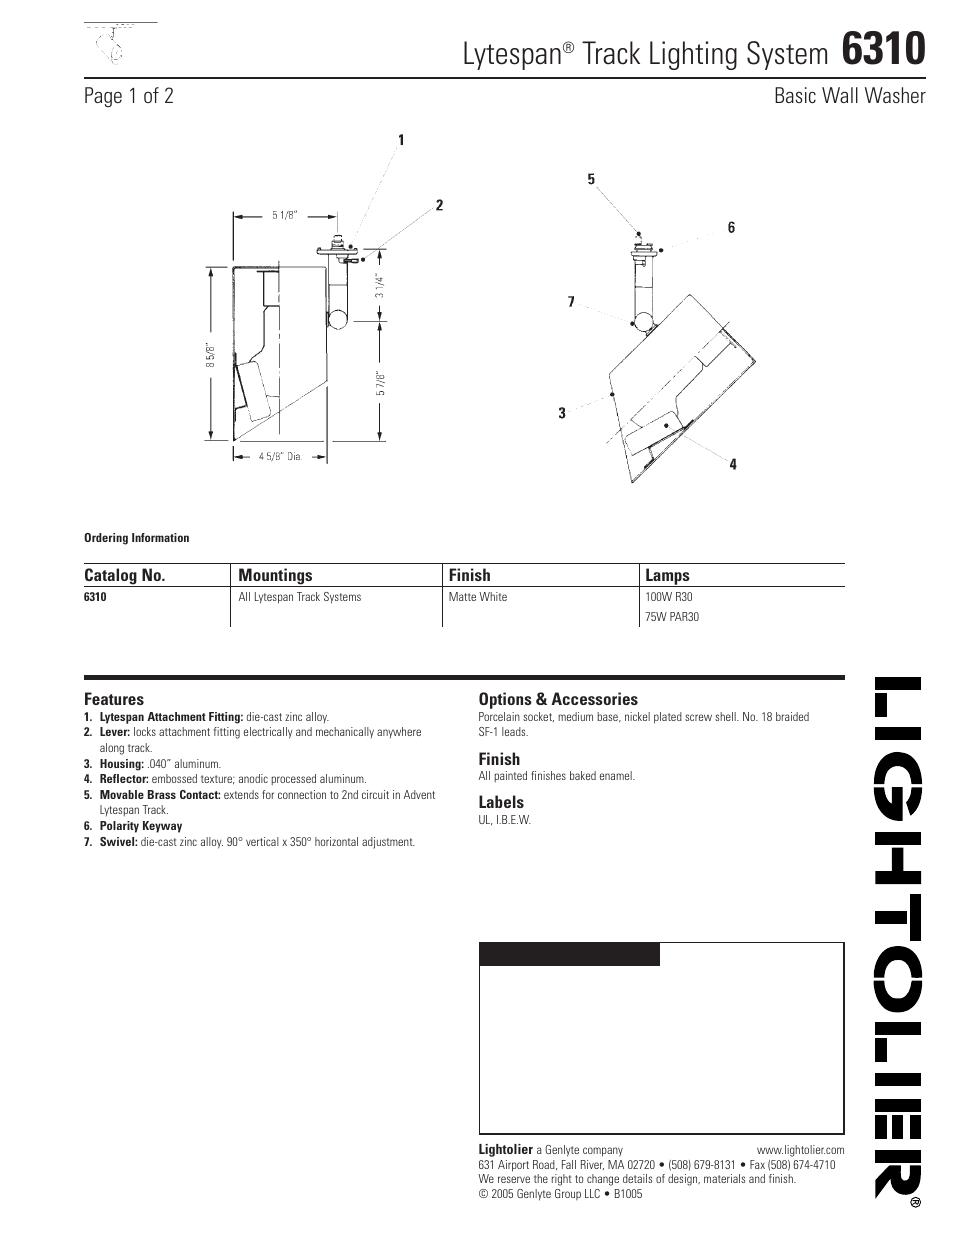 lightolier lytespan track lighting system 6310 user manual 2 pages